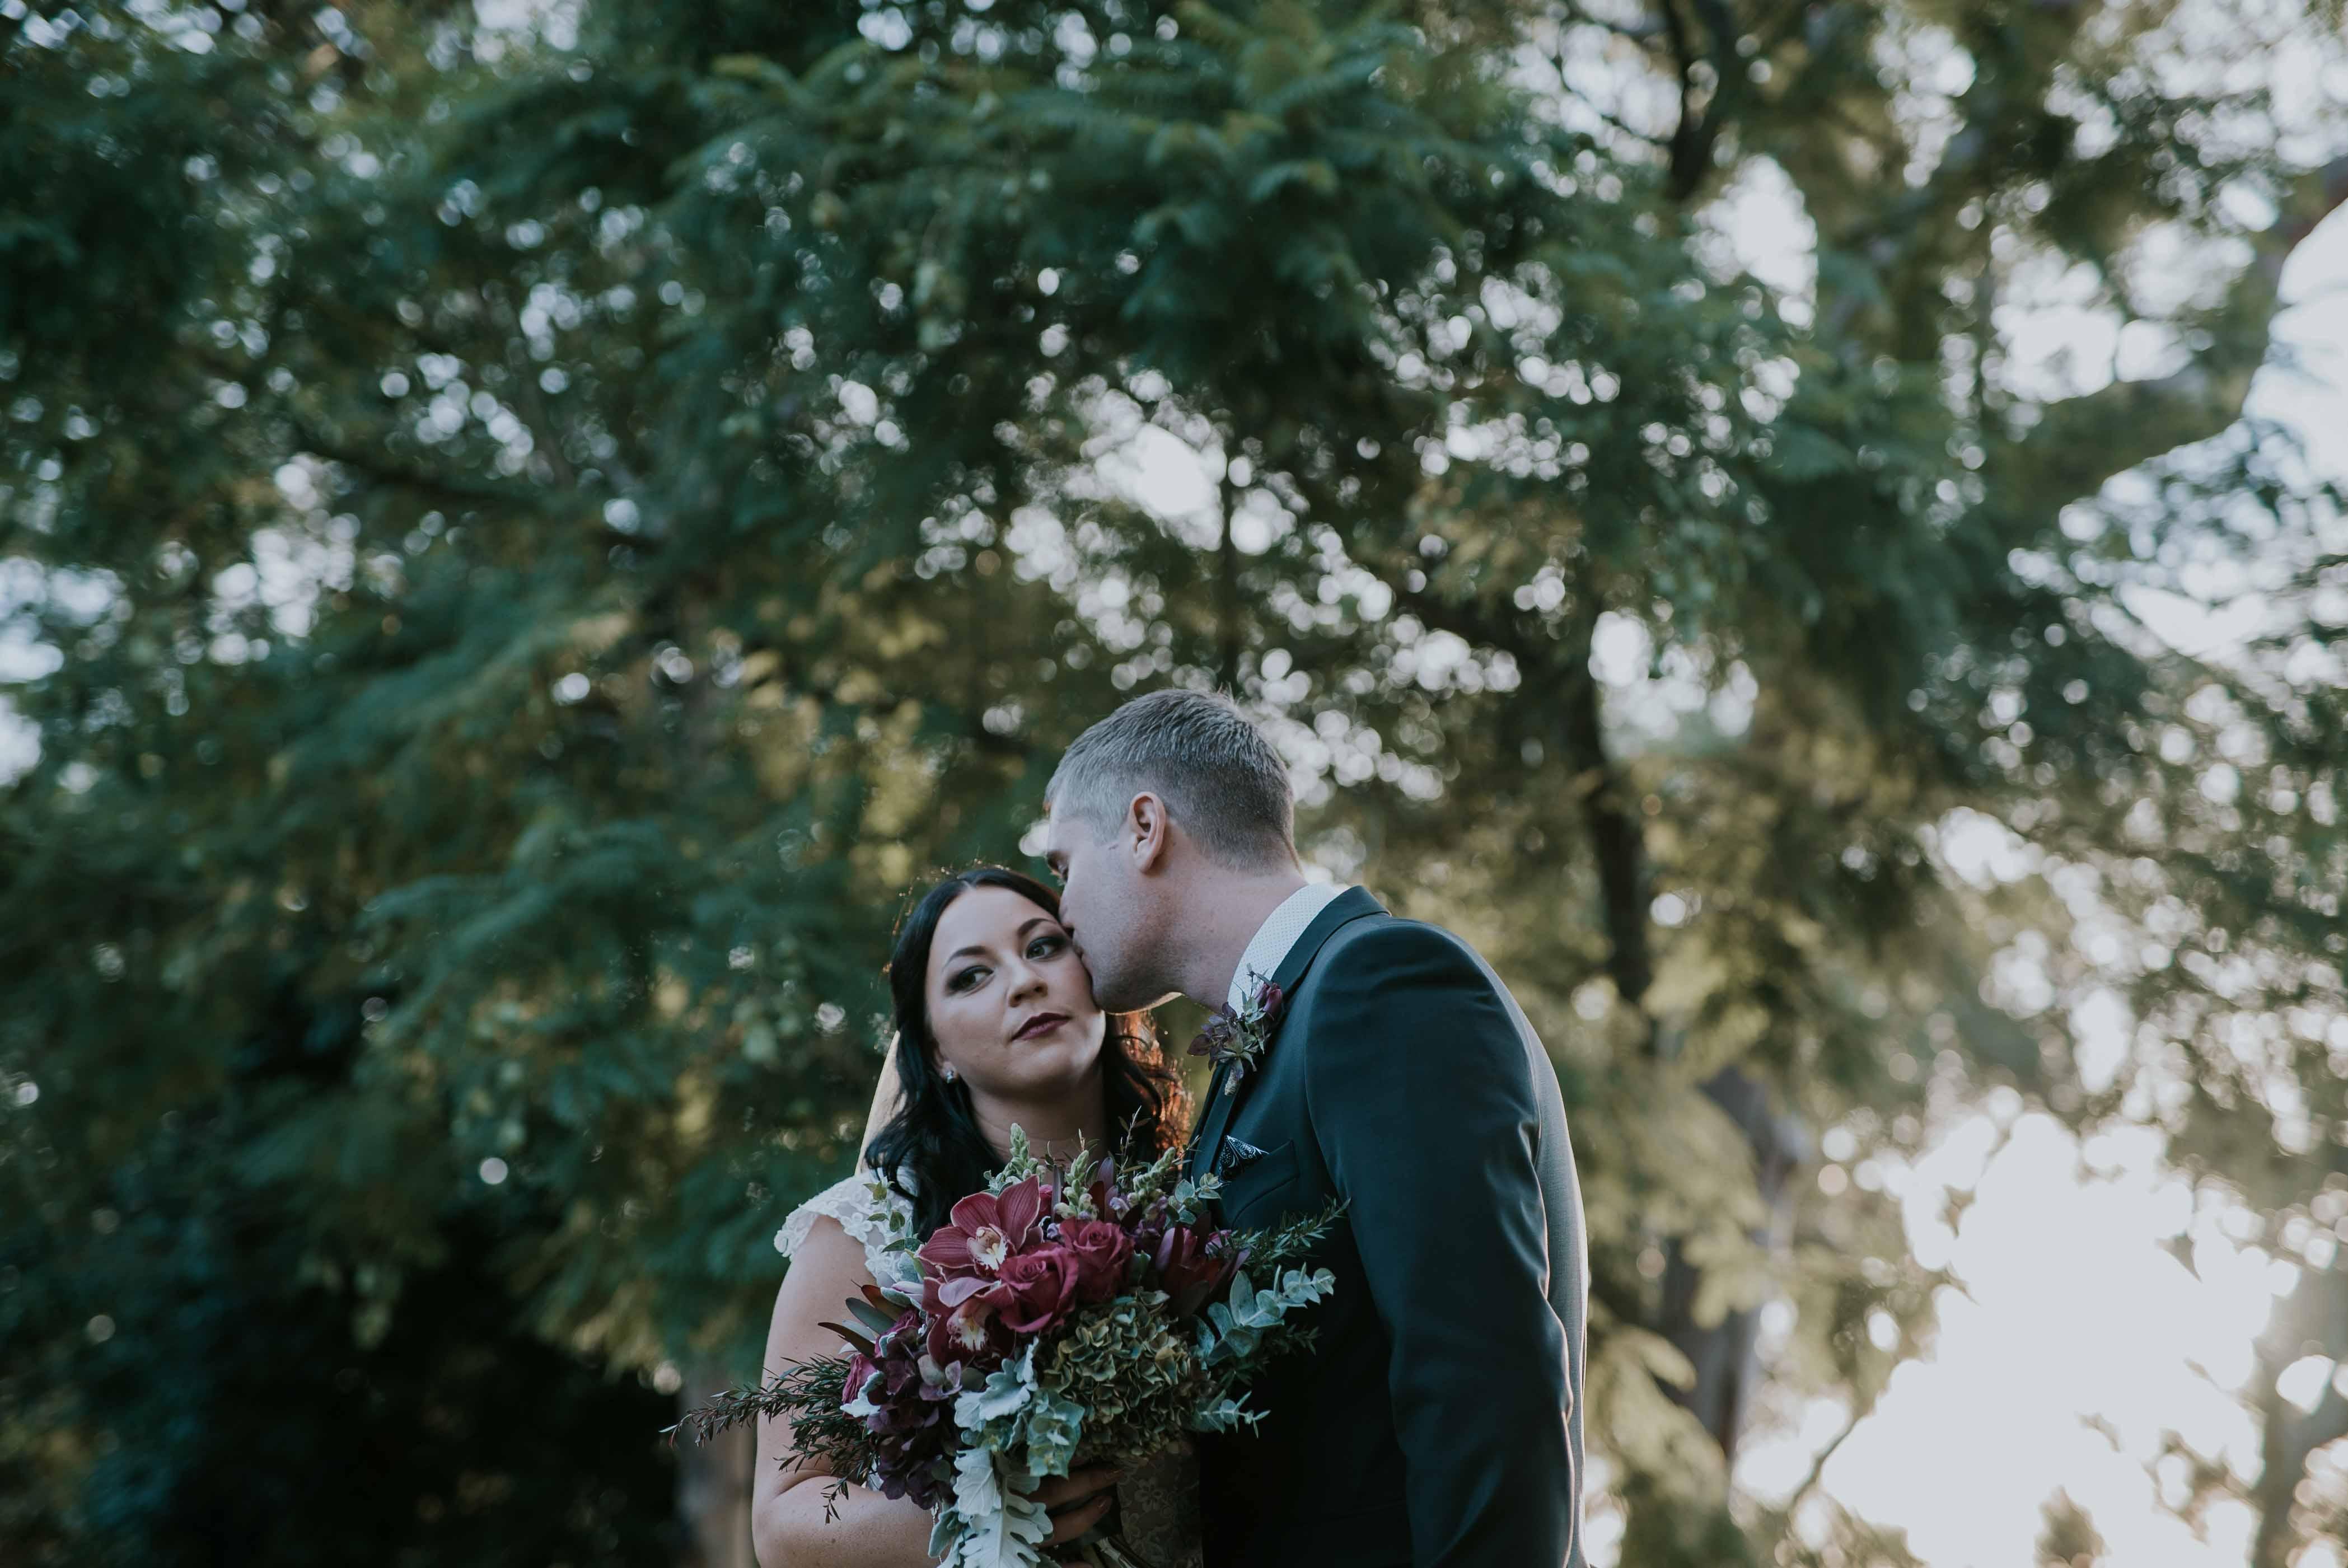 Anthony + Teigan | 08/04/2017 | Port Stephens Wedding Video | Wonganella Estate, Bobs Farm, NSW